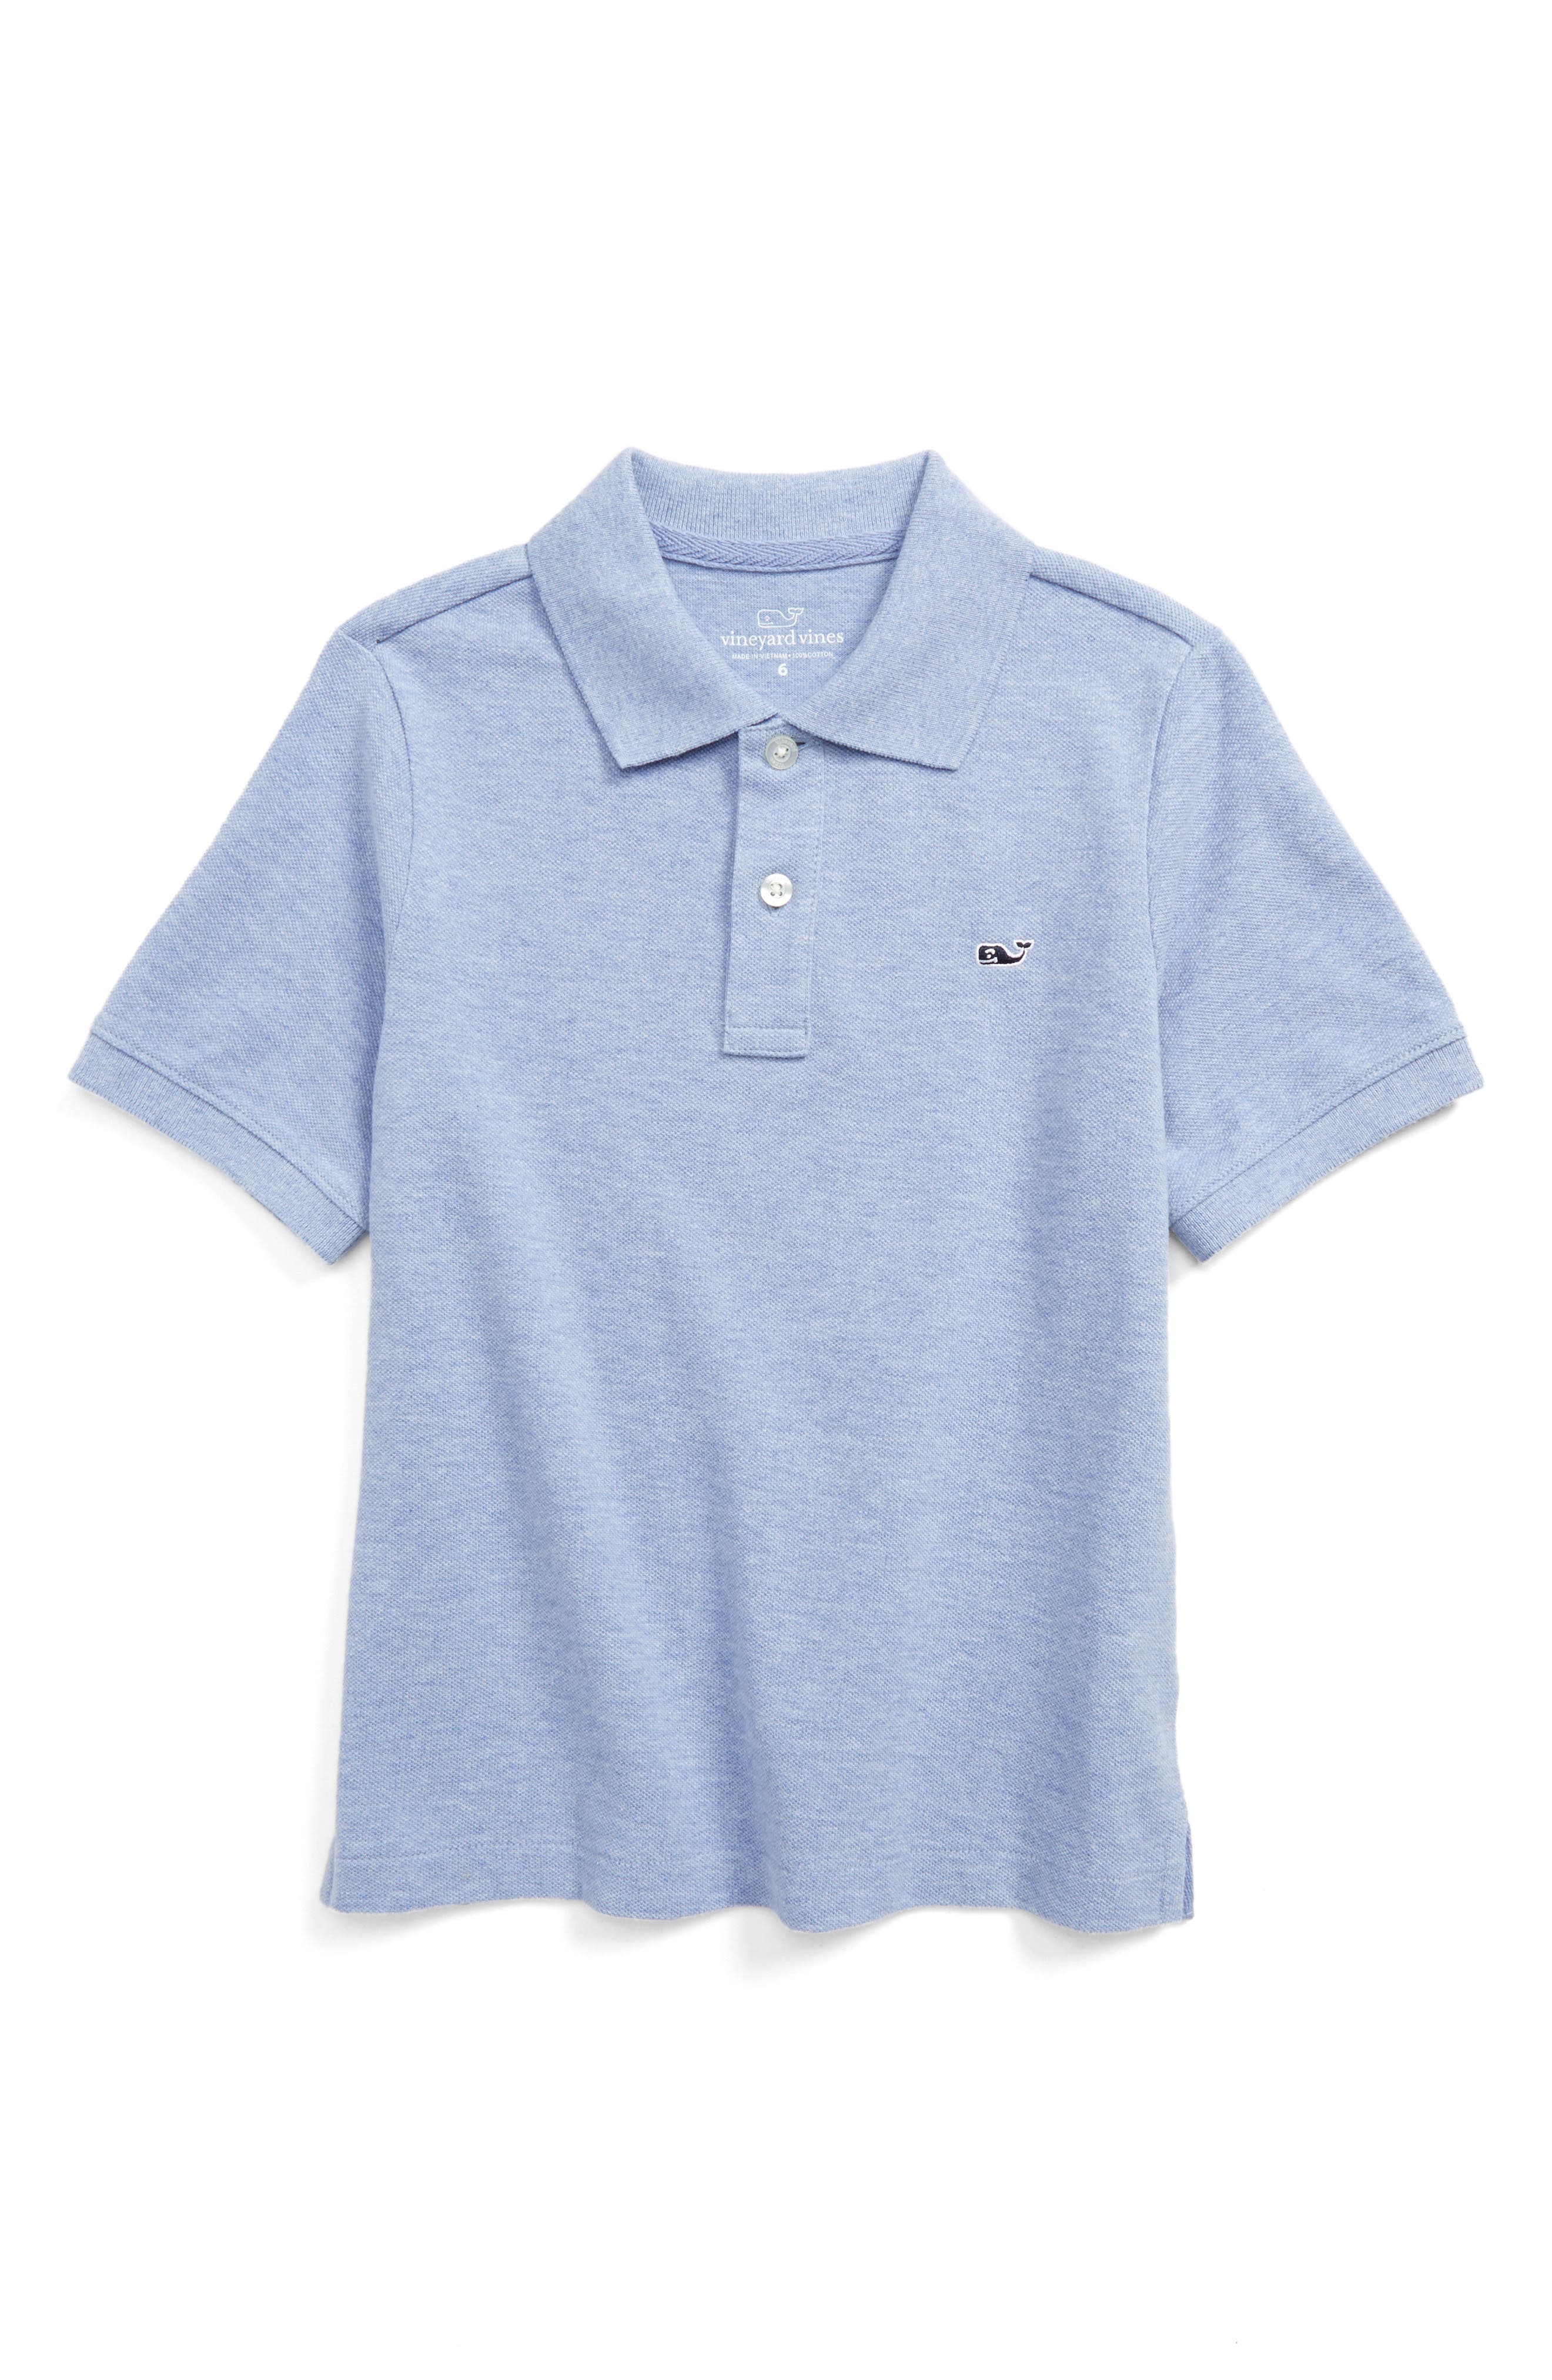 VINEYARD VINES Piqué Cotton Polo